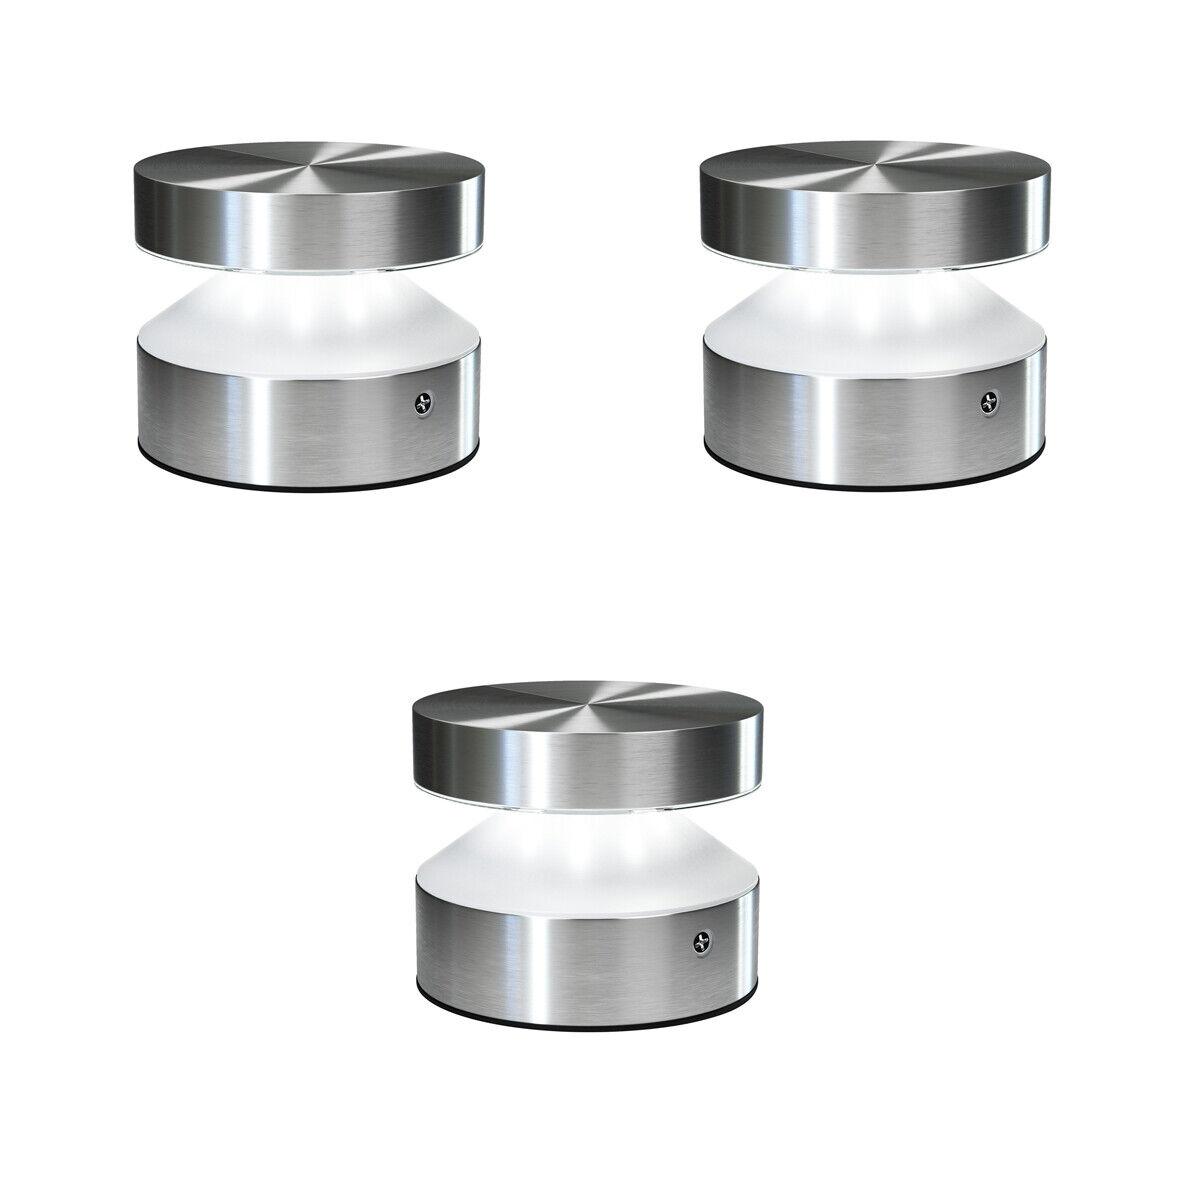 OSRAM ENDURA STYLE Cylinder LED-Leuchte Ø 10,2 cm Edelstahl 6W=33W warm weiß 3er